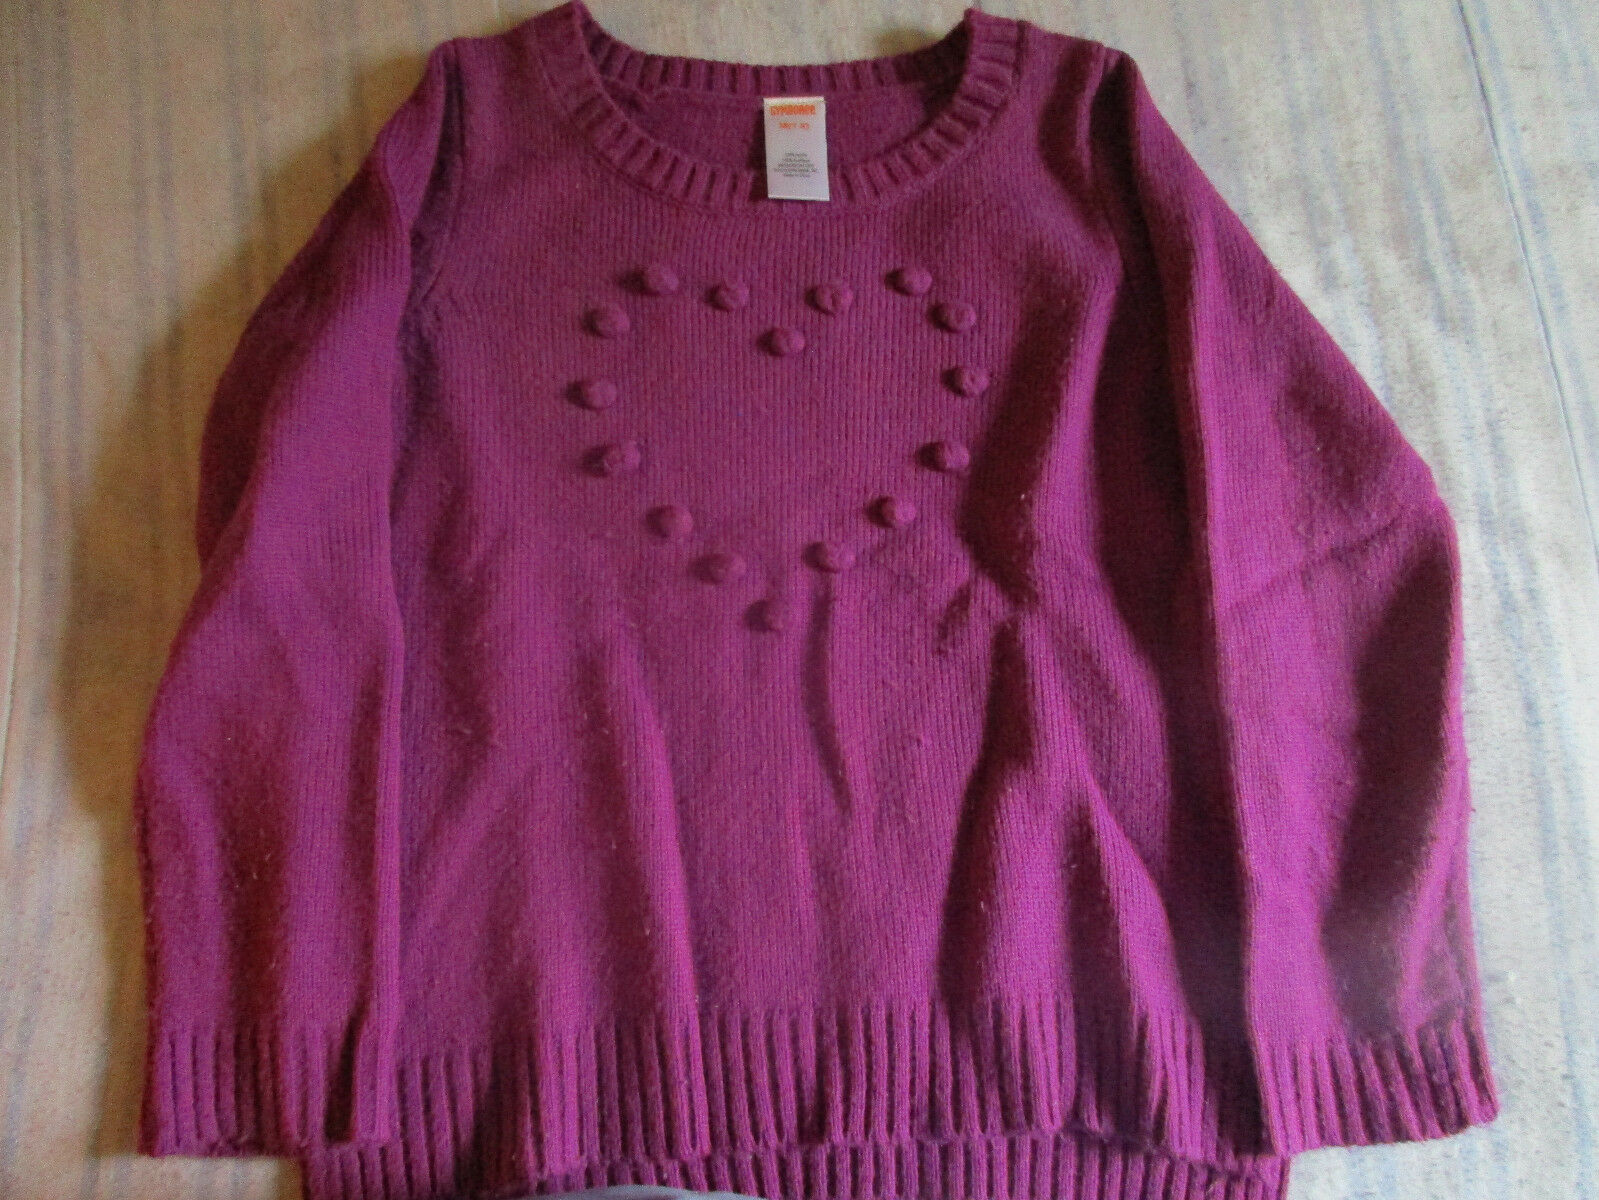 VGUC Gymboree Girls Size 7/8 Sweater Weather Magenta Bauble Heart Sweater - $9.99